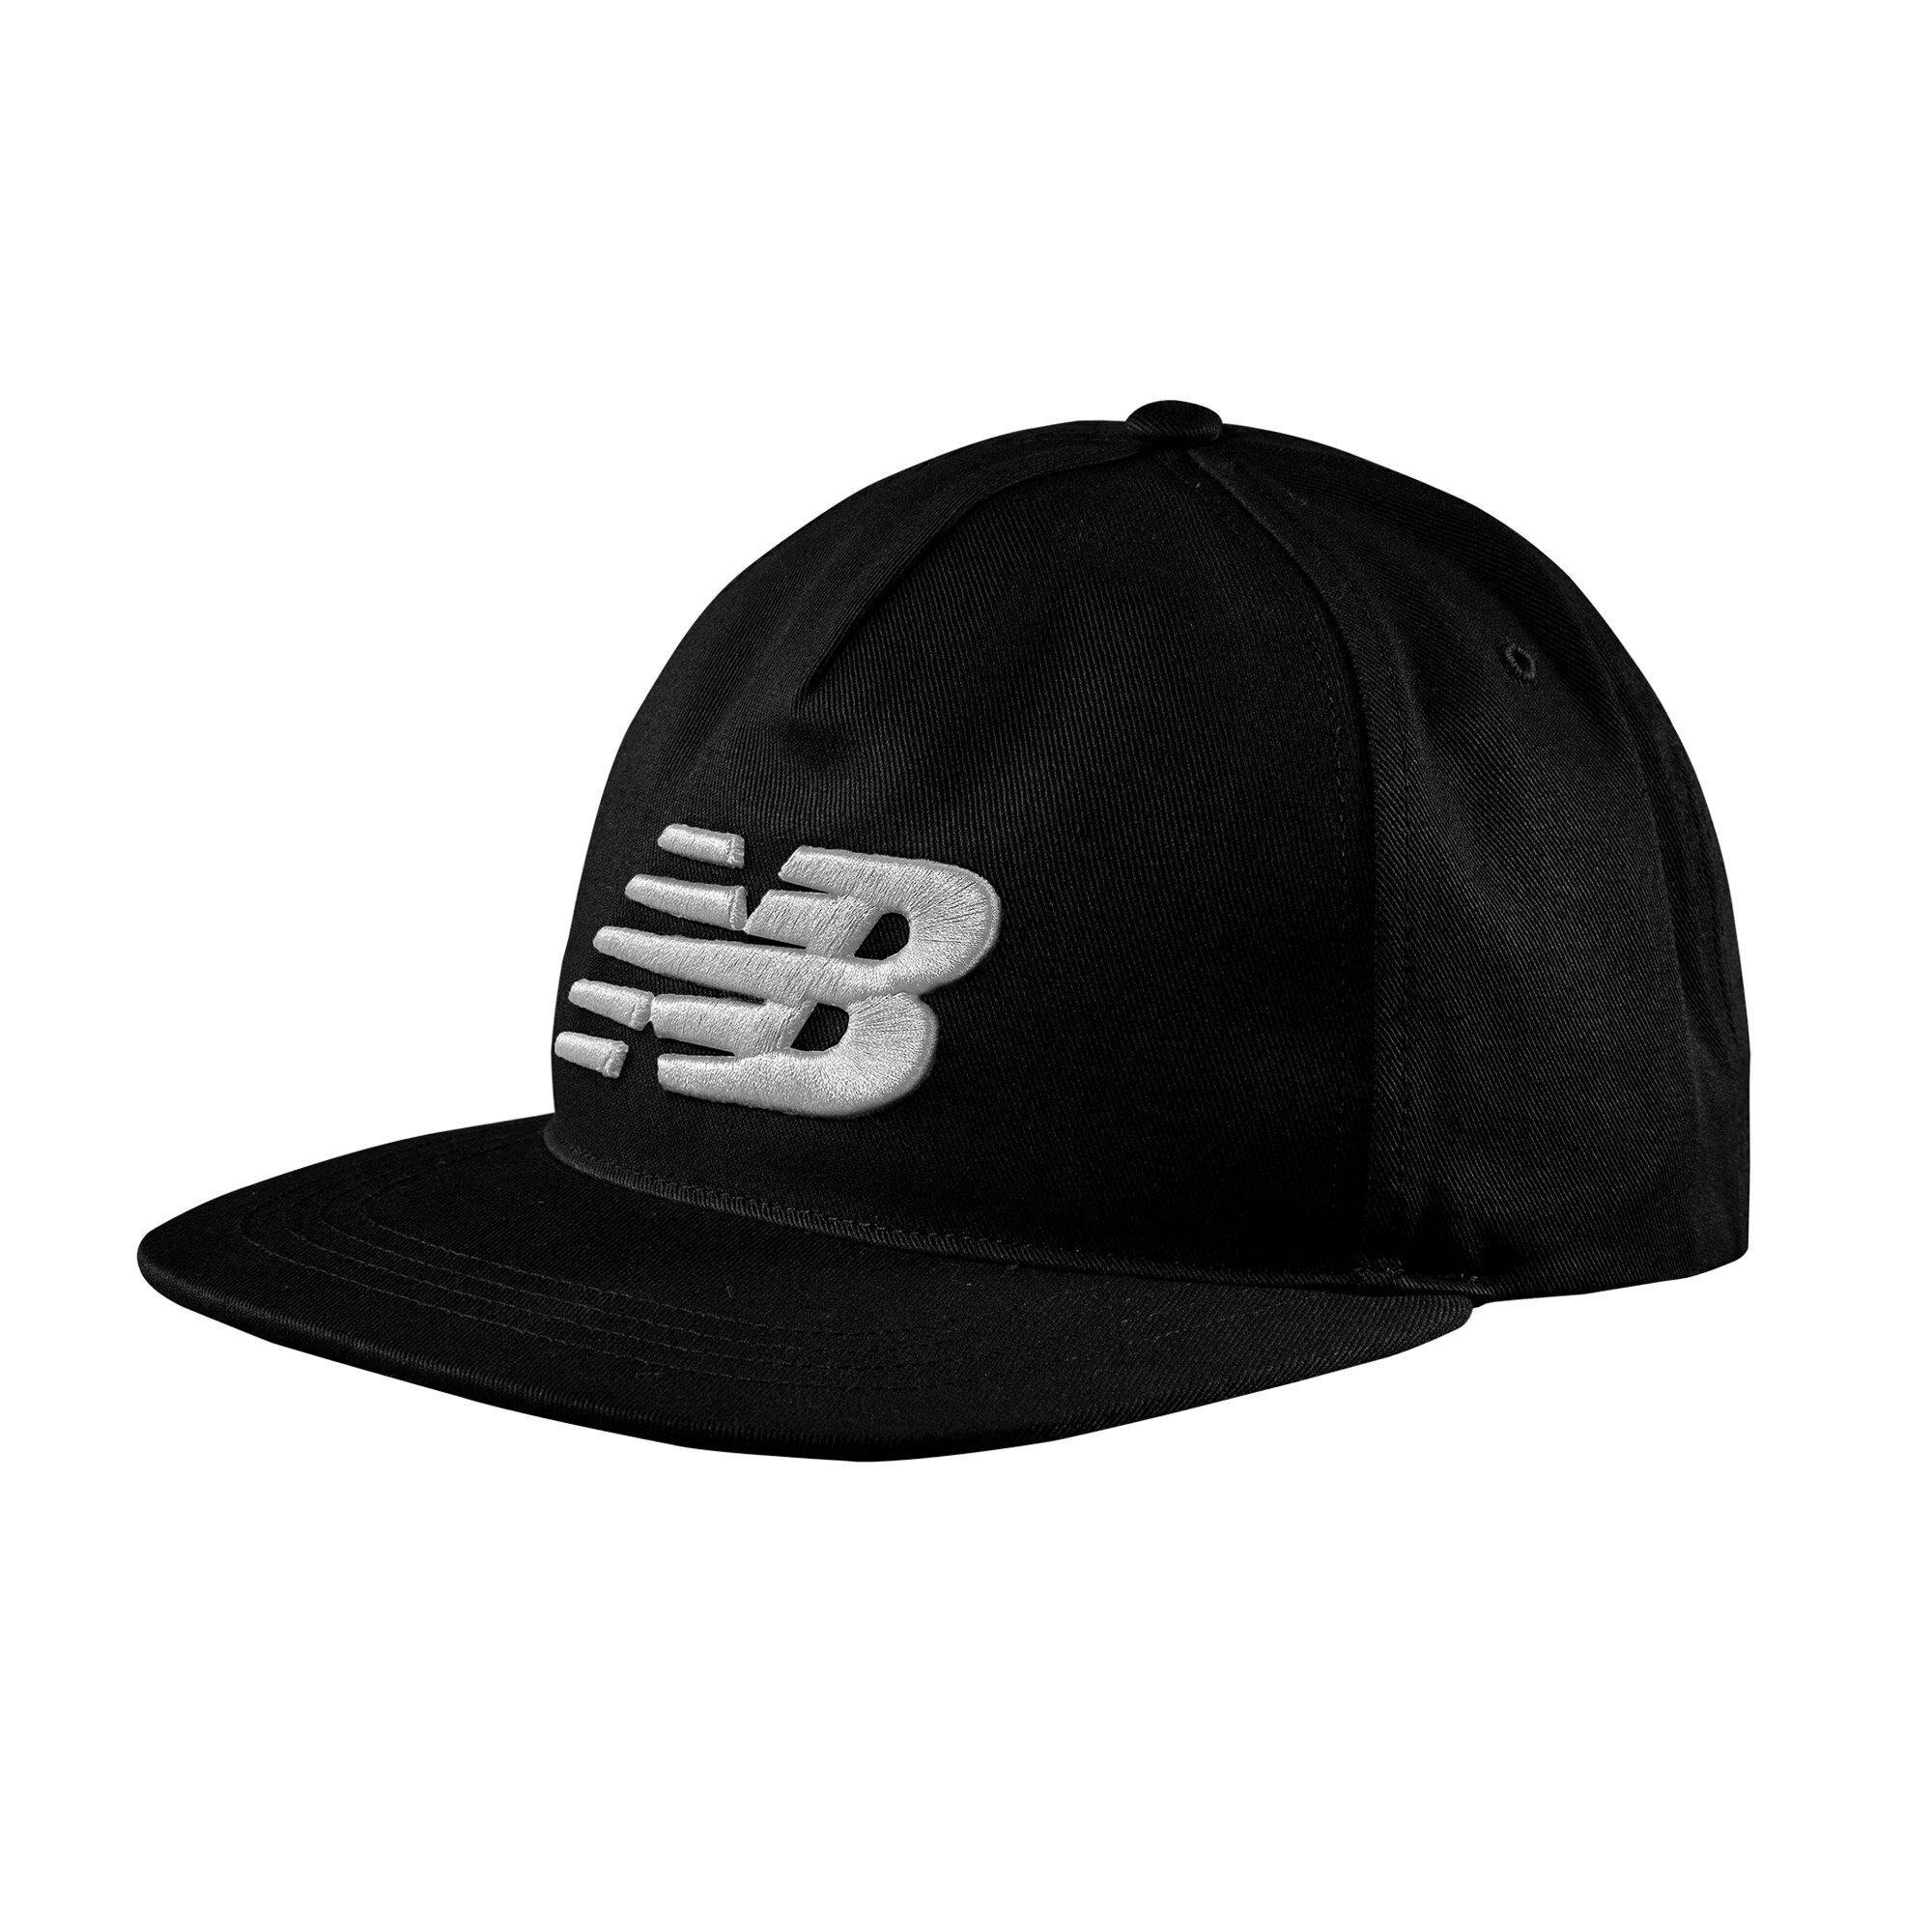 NEW BALANCE 棒球帽 舒適 LOGO 繡花 黑【運動世界】500196-001